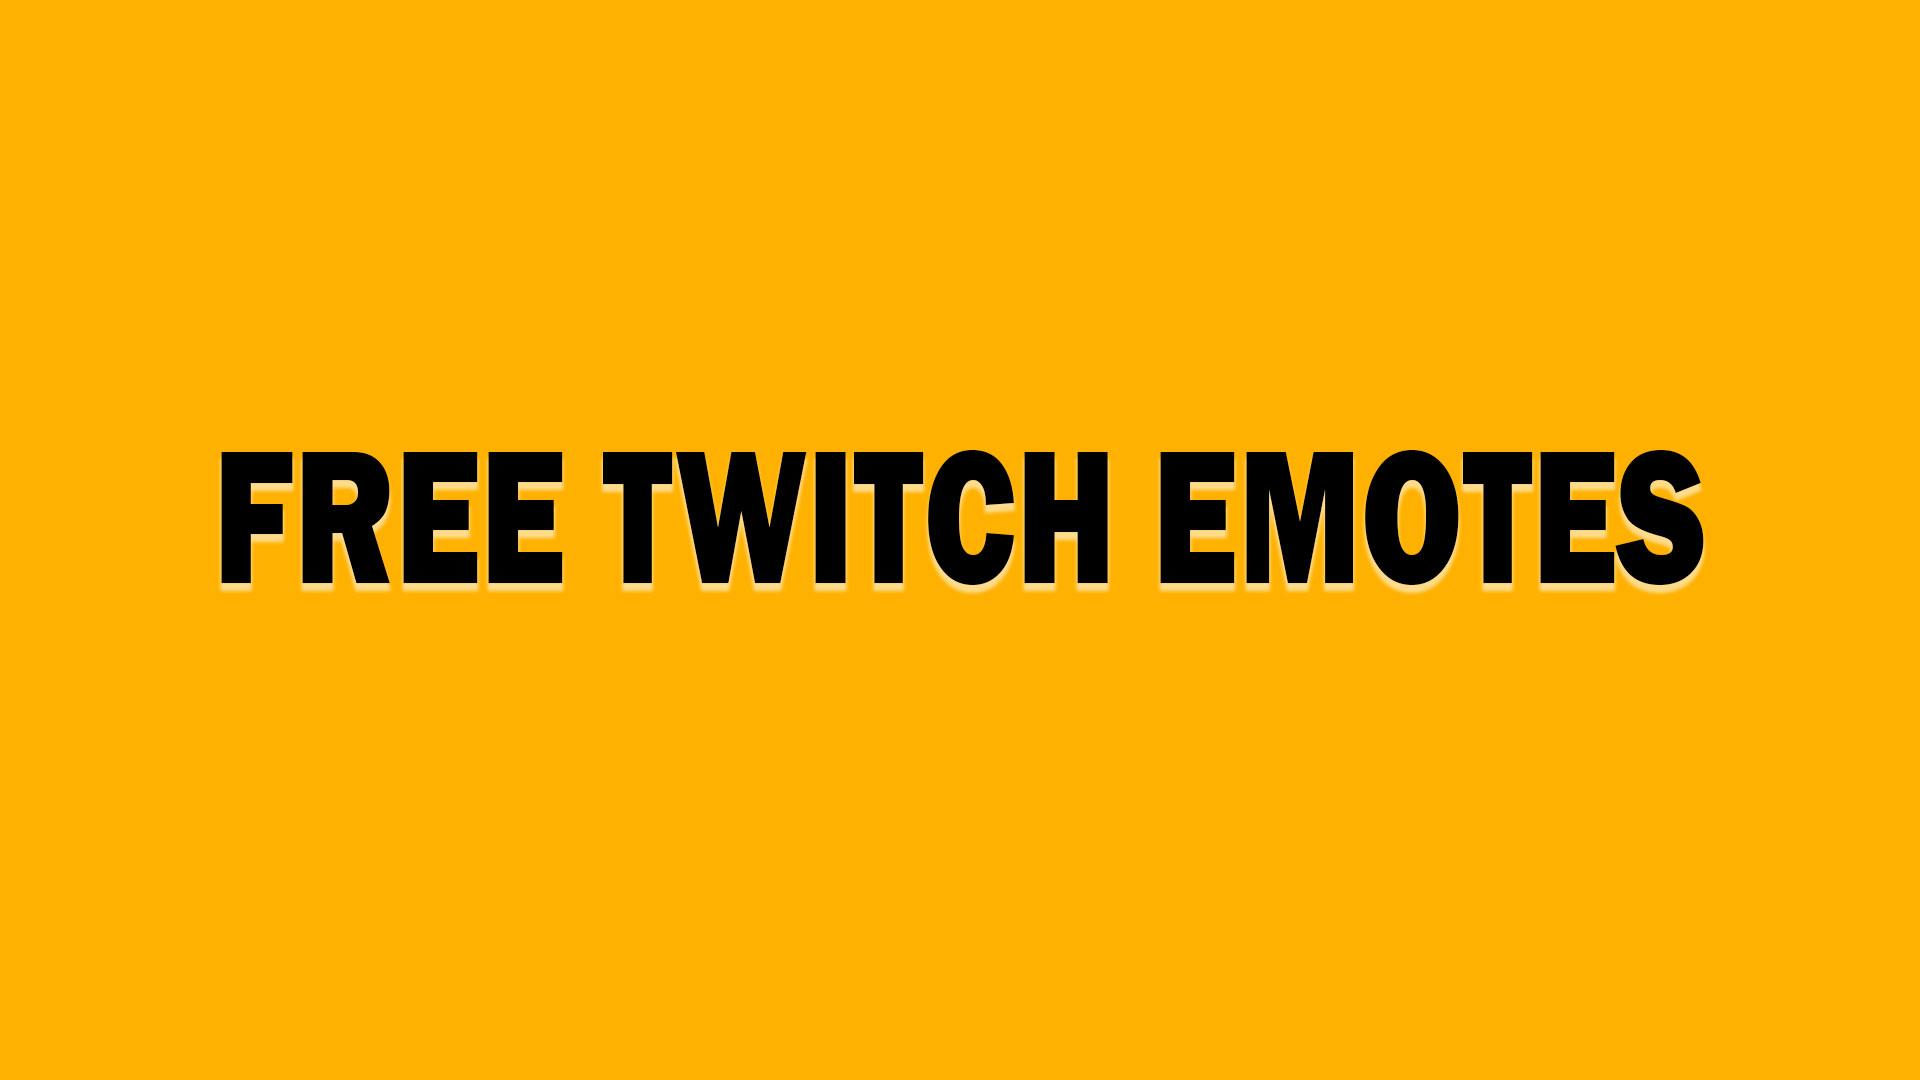 free-twitch-emotes